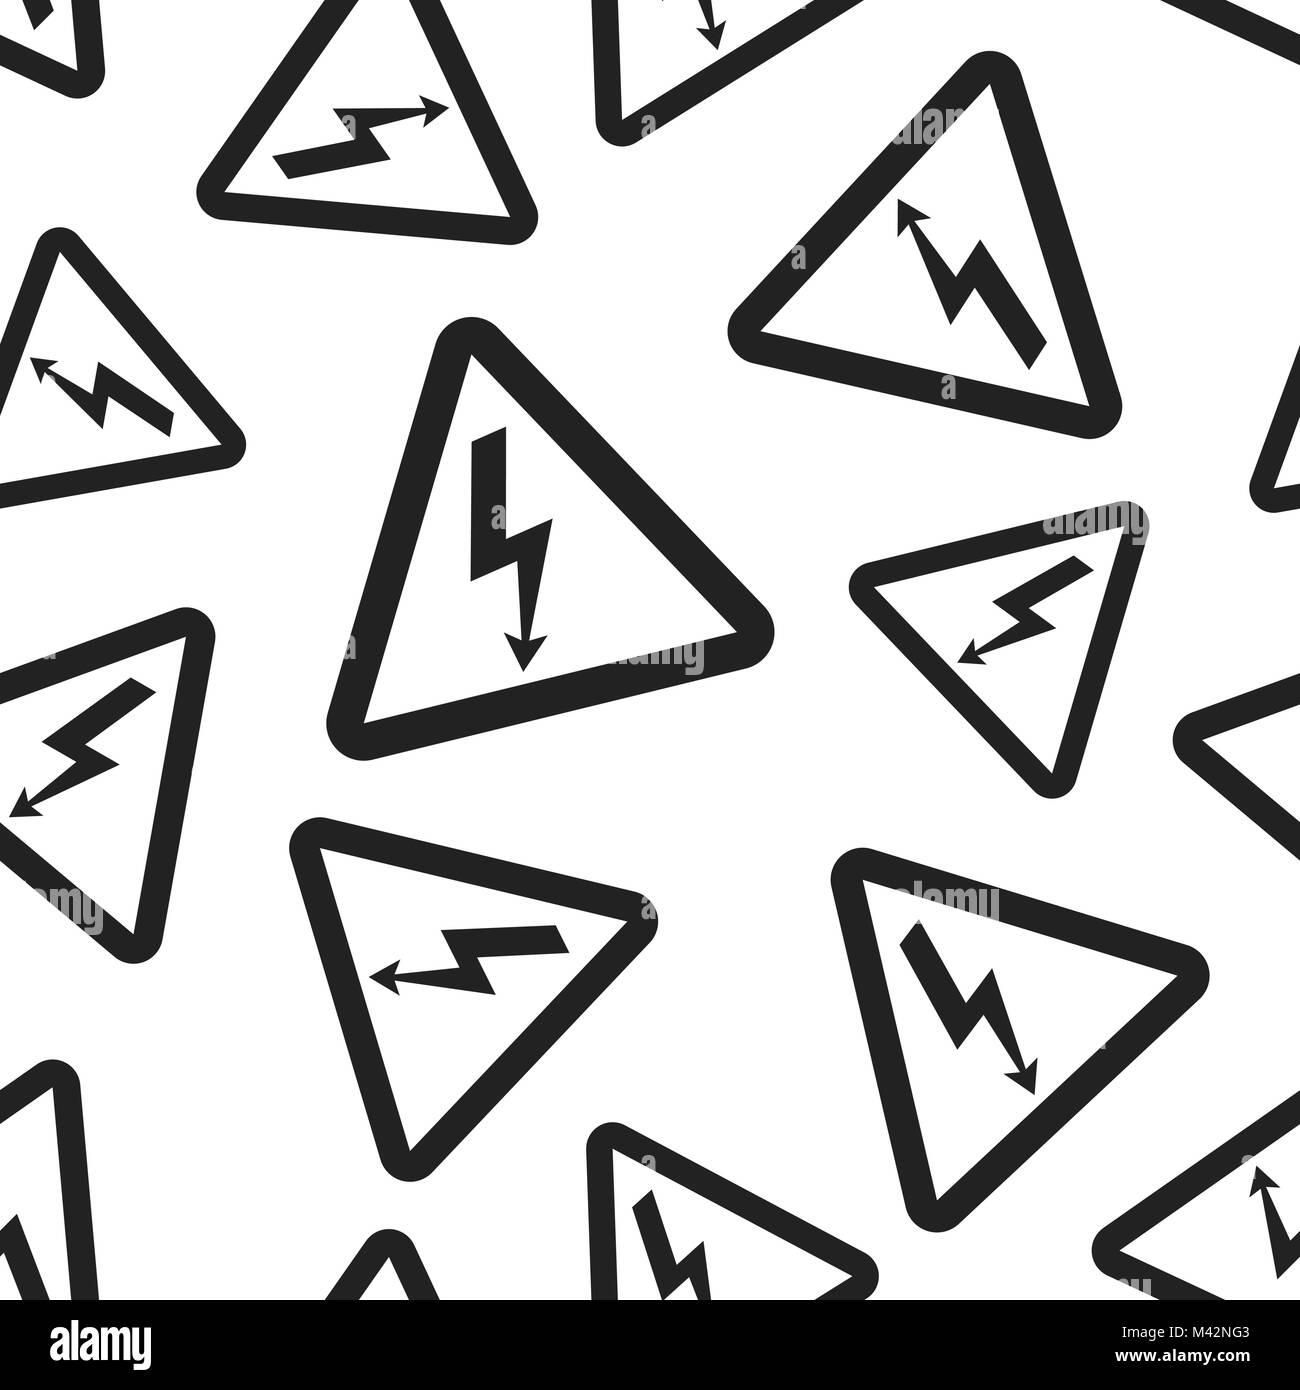 High voltage danger sign seamless pattern background business high voltage danger sign seamless pattern background business flat vector illustration danger electricity symbol buycottarizona